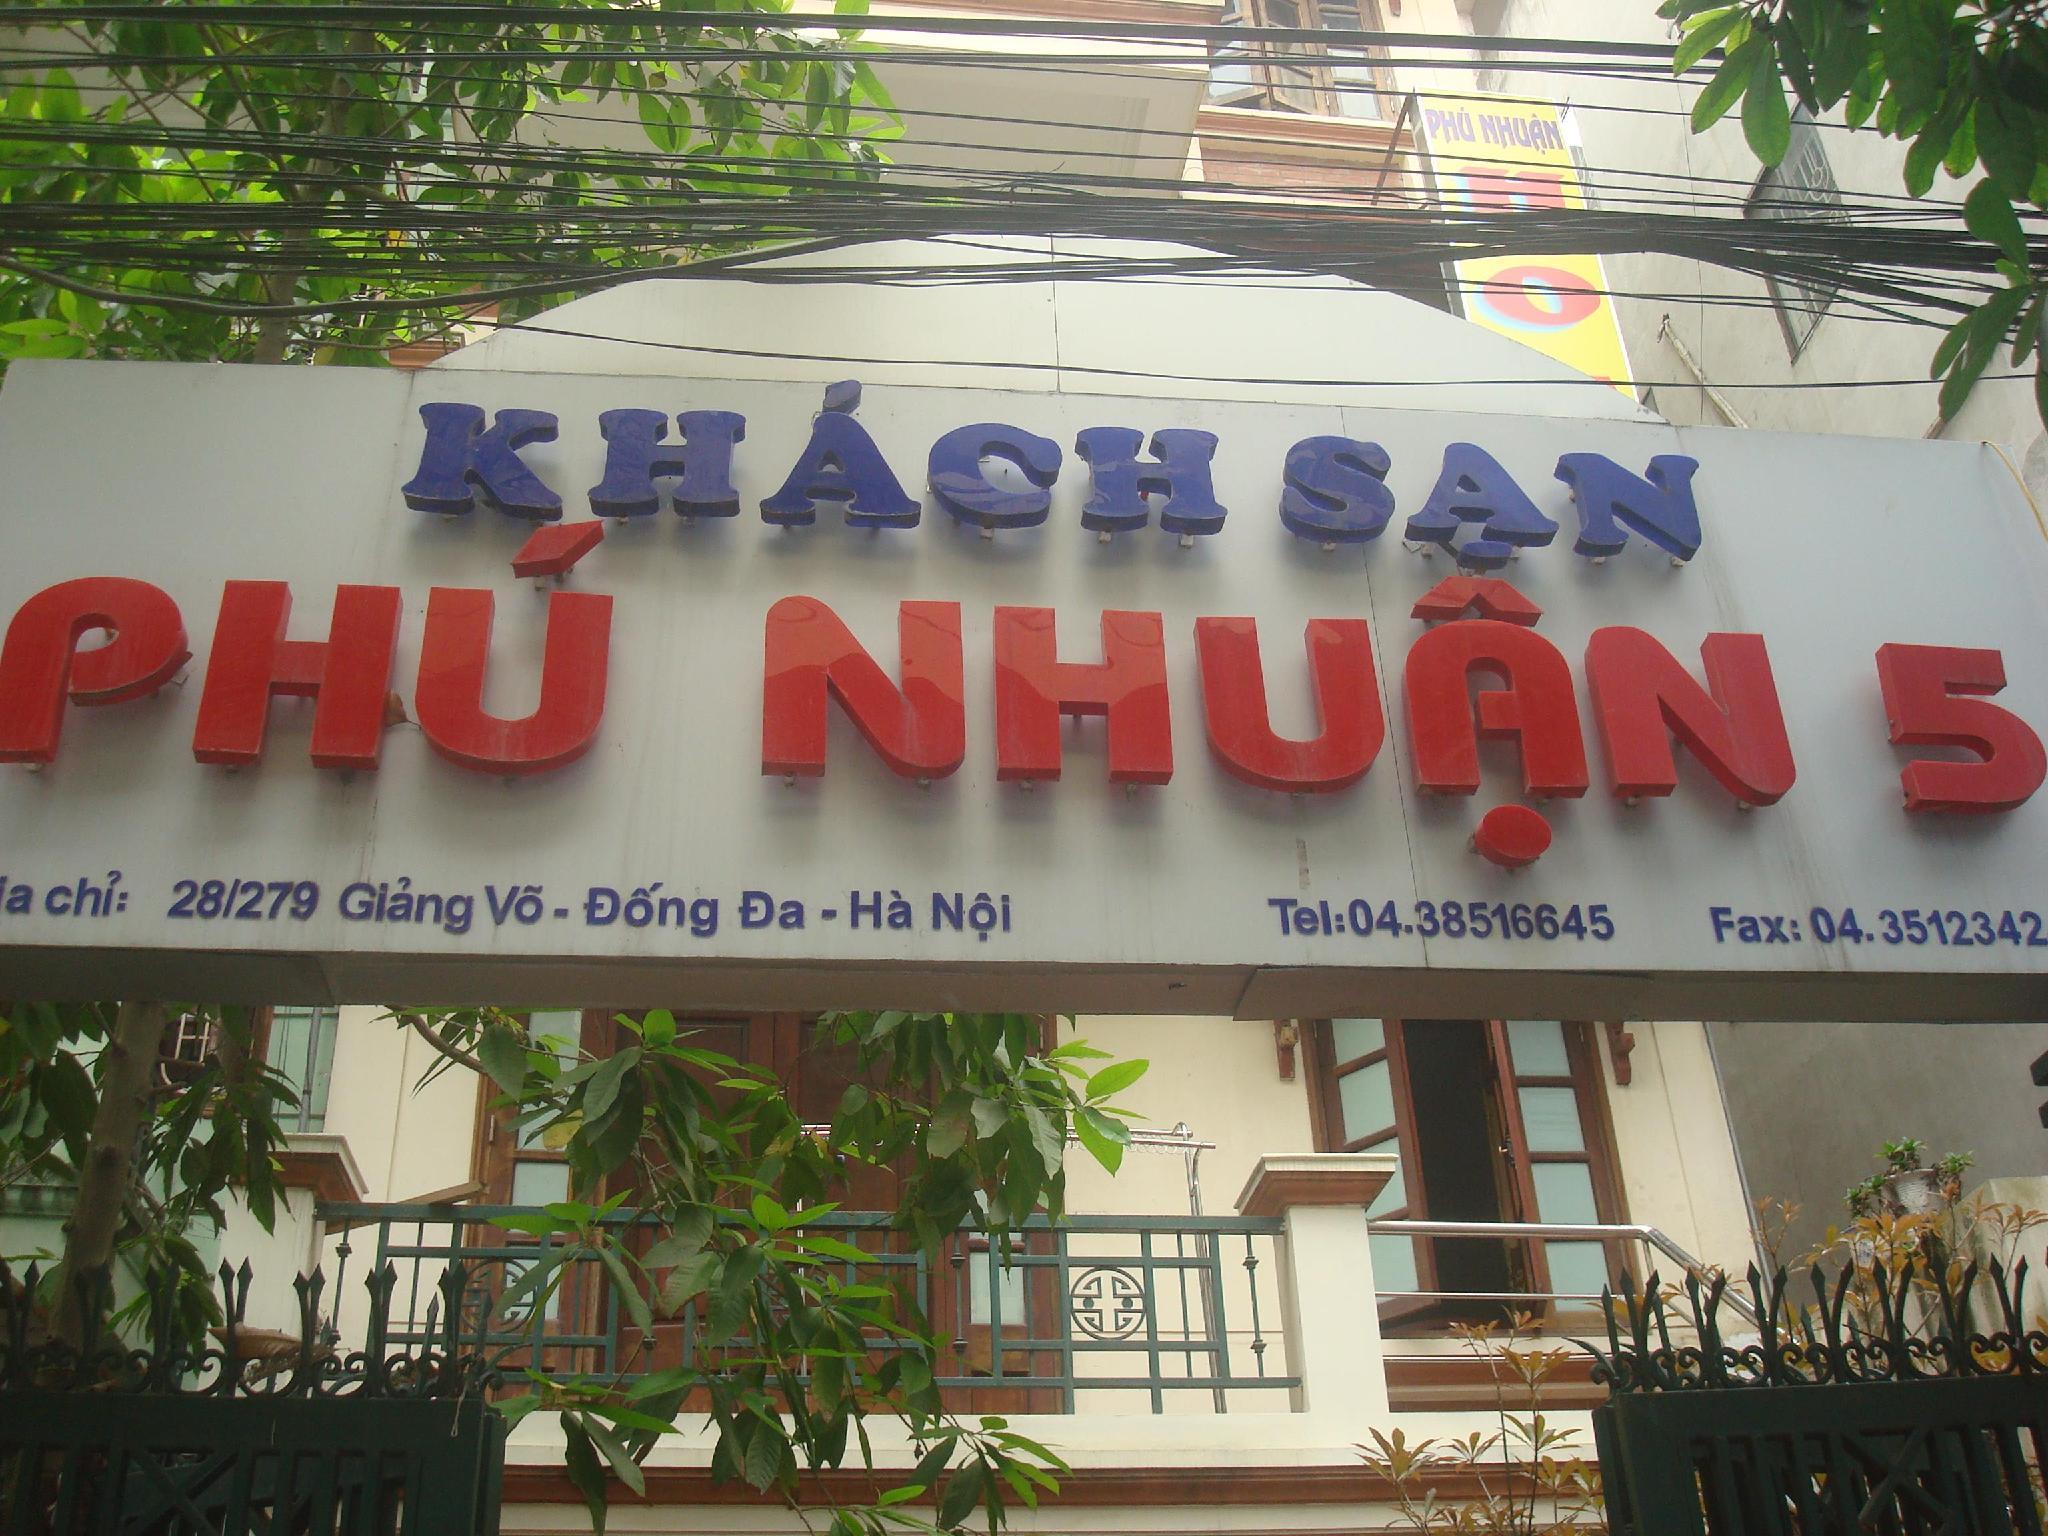 Phu Nhuan Hotel 5 - Giang Vo - Hotell och Boende i Vietnam , Hanoi